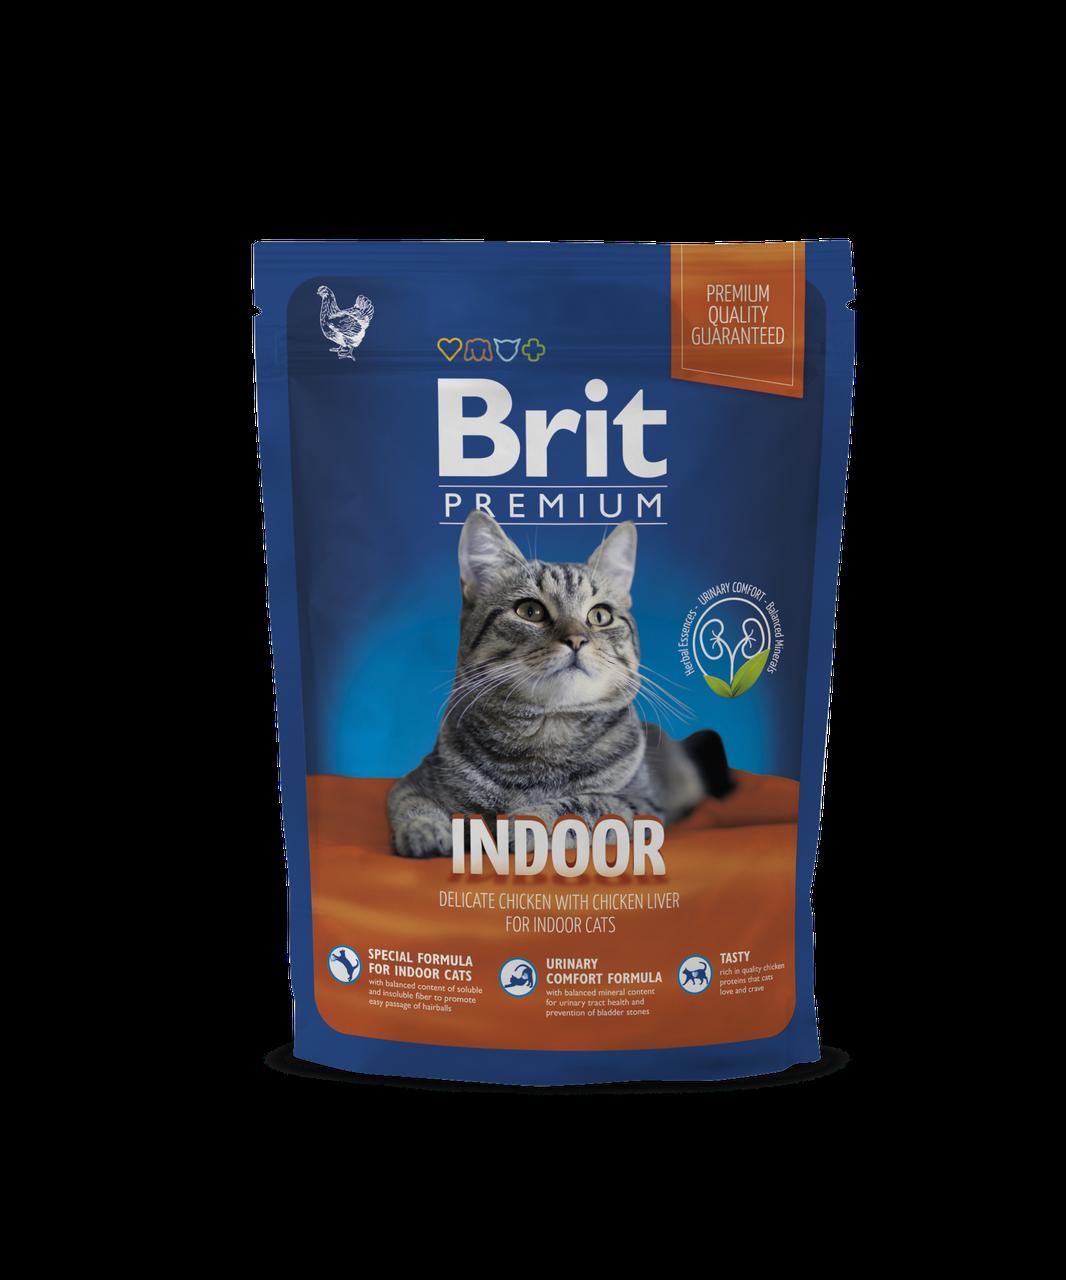 Brit Premium Cat Indoor корм для кошек, живущих в помещении, 800 г